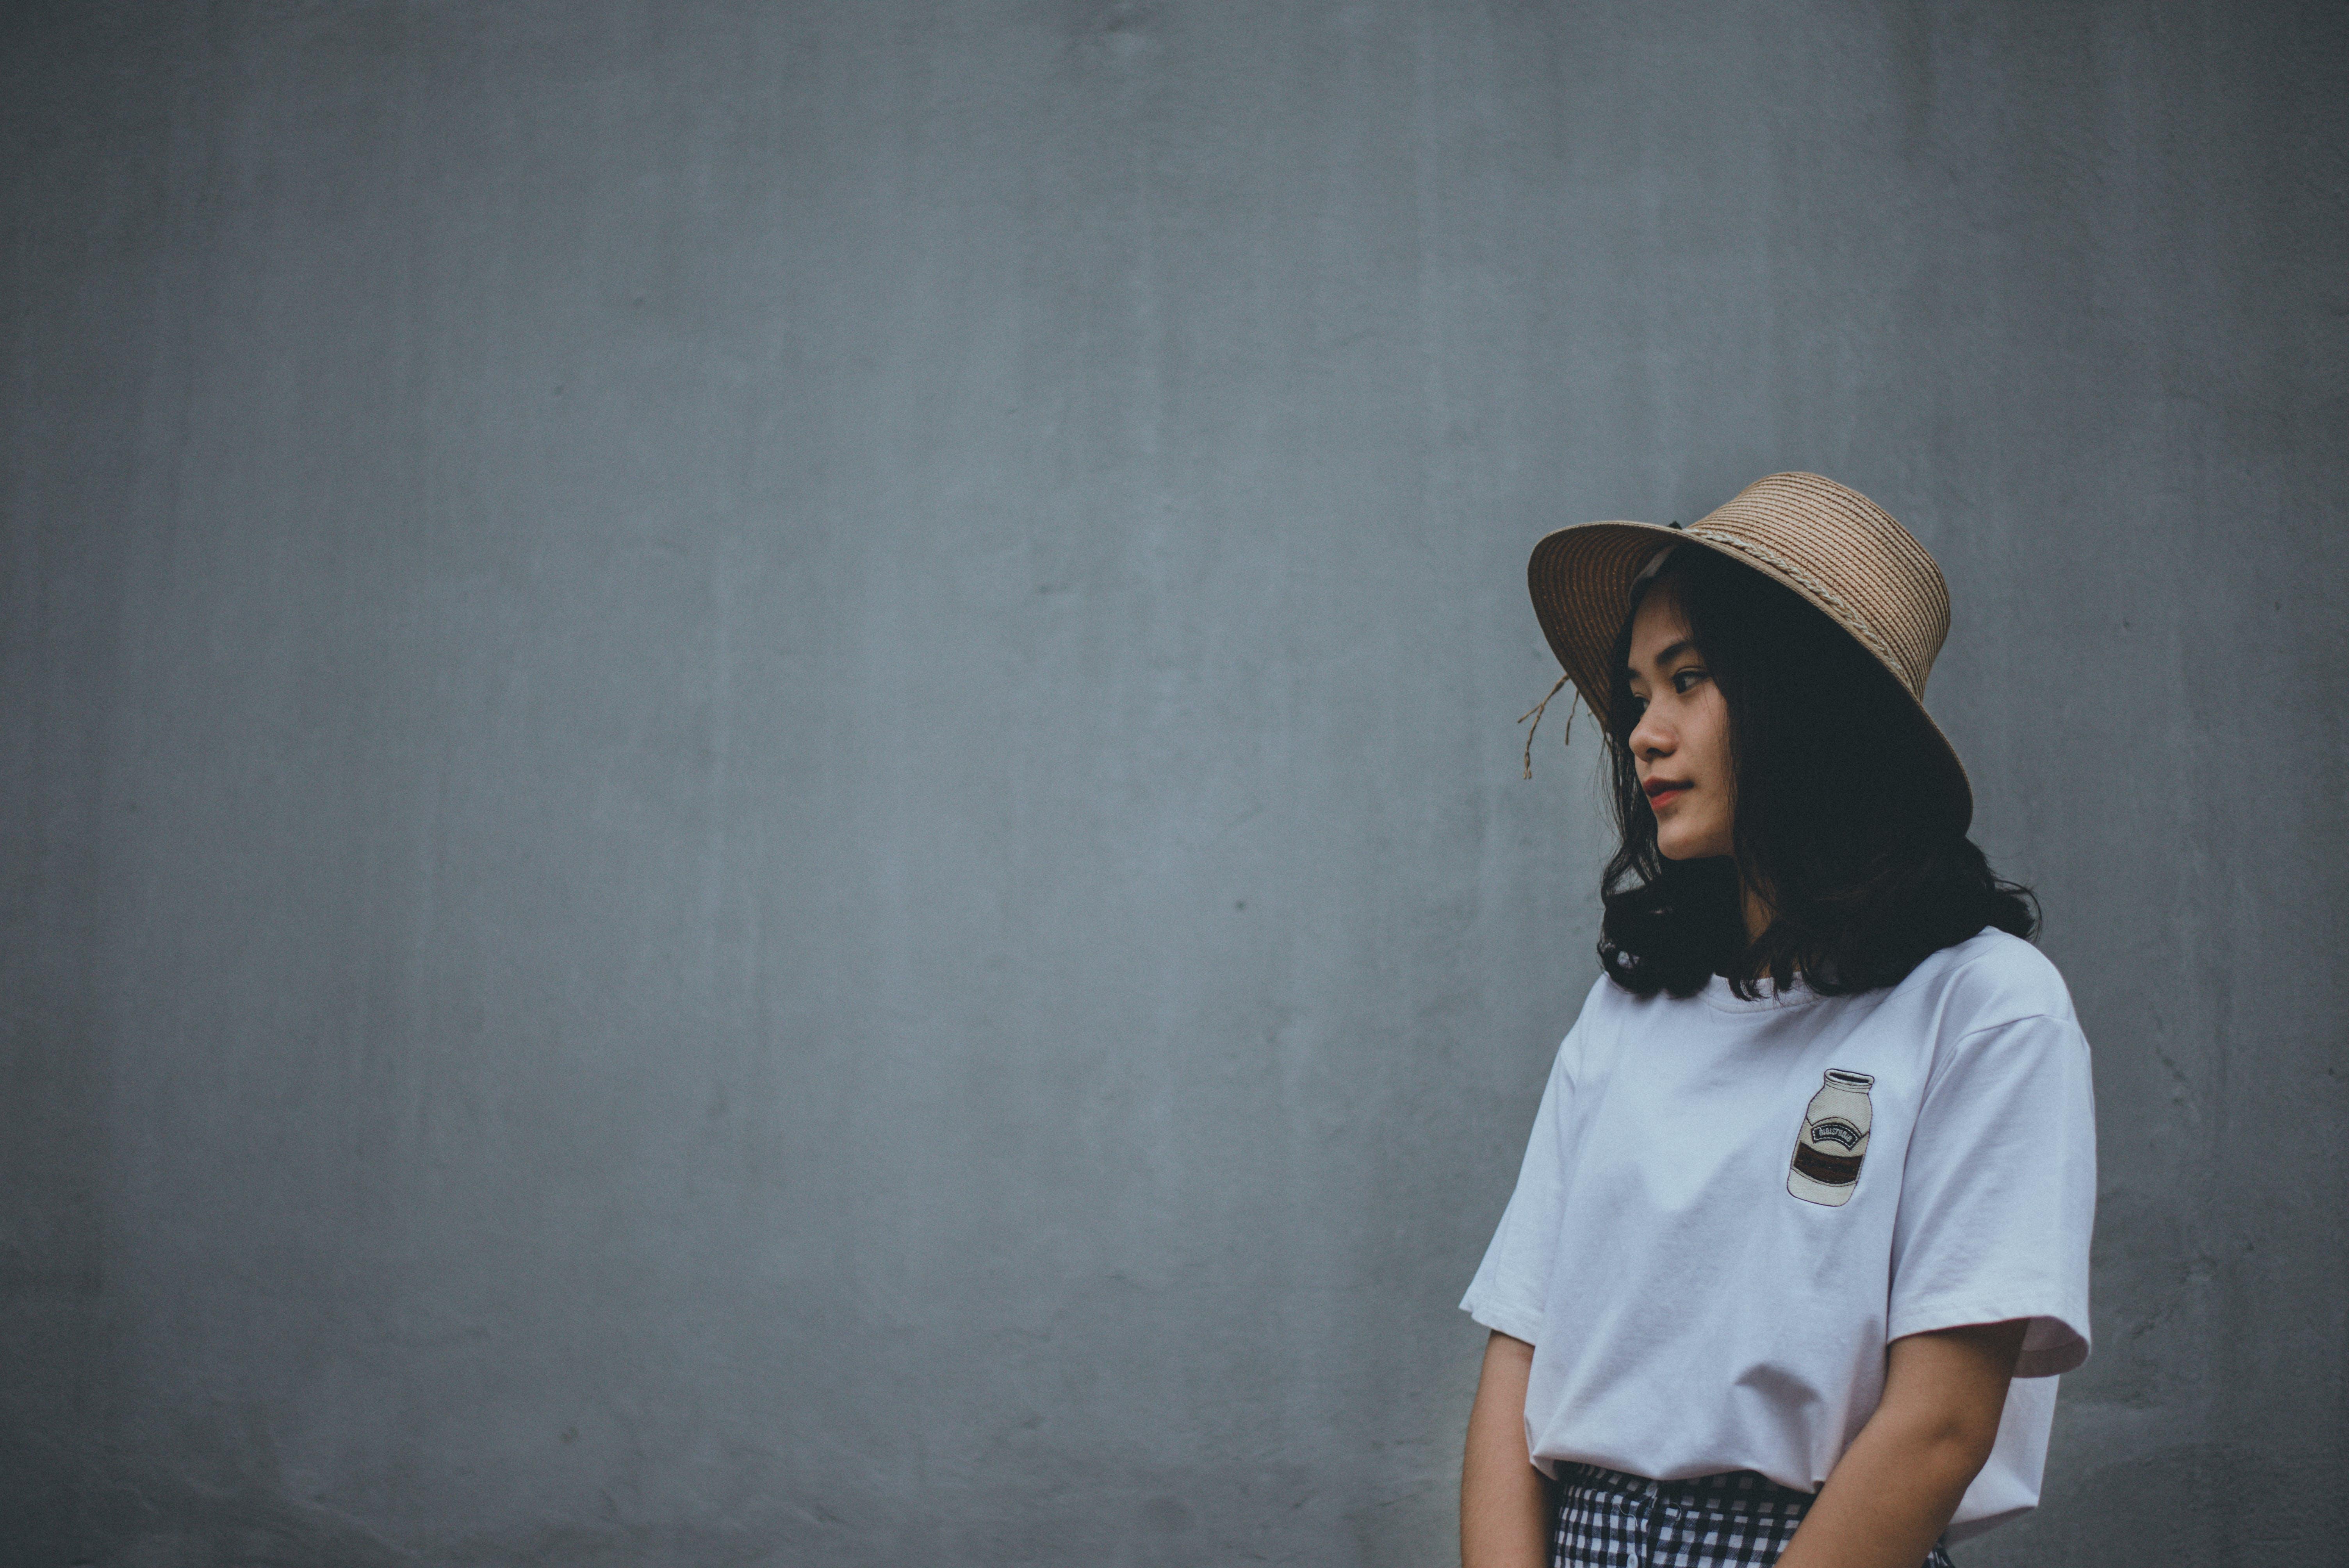 Woman in White Shirt Wearing Brown Hat